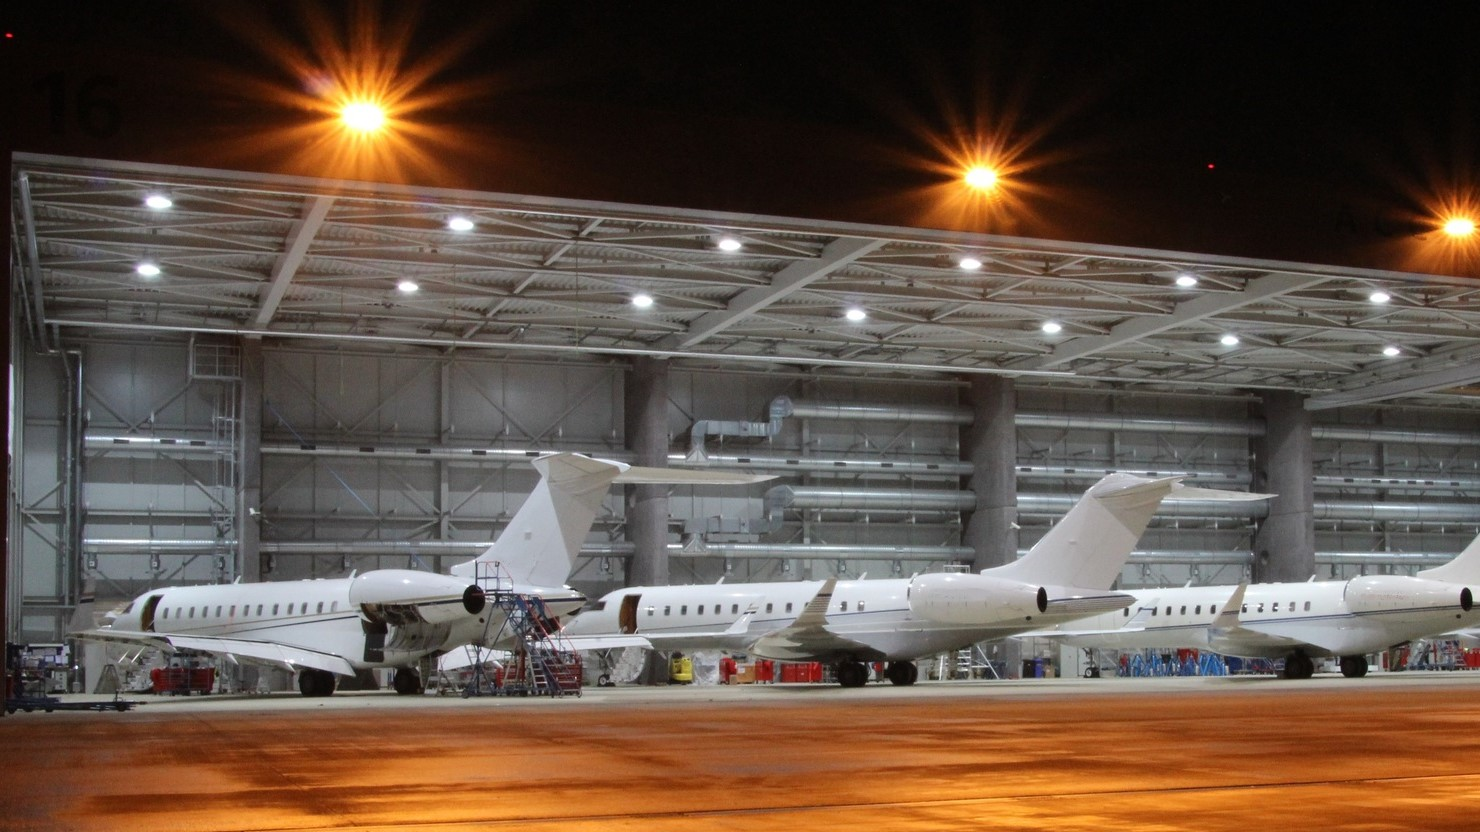 ACC Columbia - ACC Columbia Jet Service GmbH